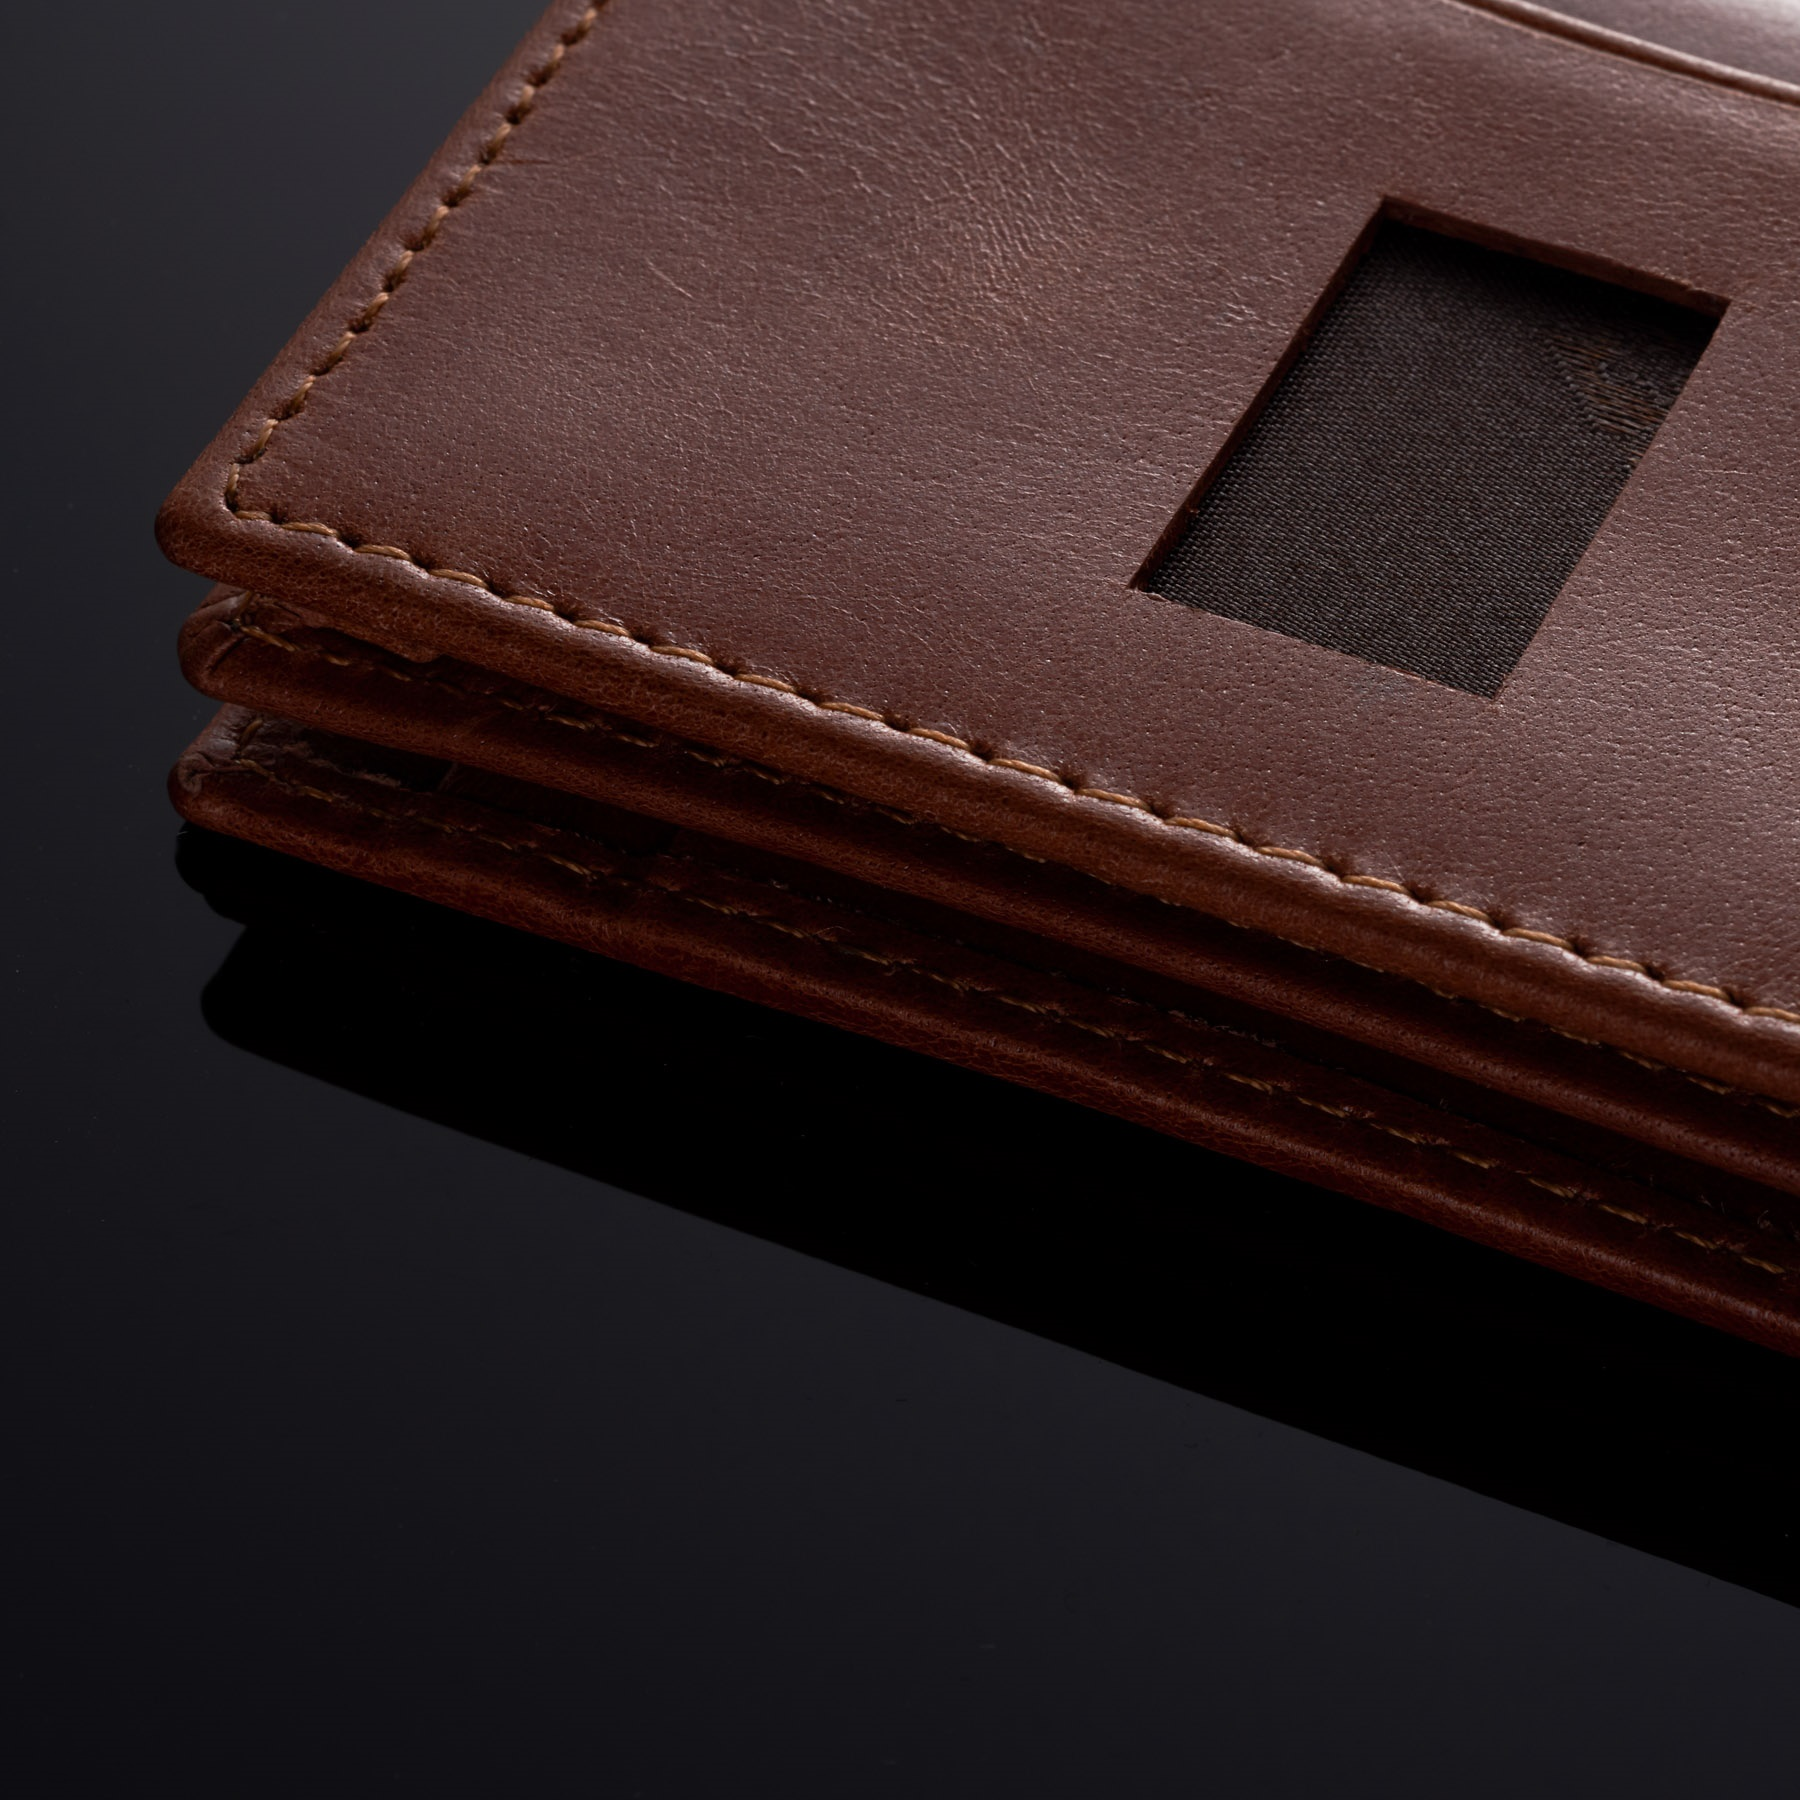 Alpine-Swiss-RFID-Leather-Business-Card-Wallet-Minimalist-ID-Window-Card-Holder thumbnail 26